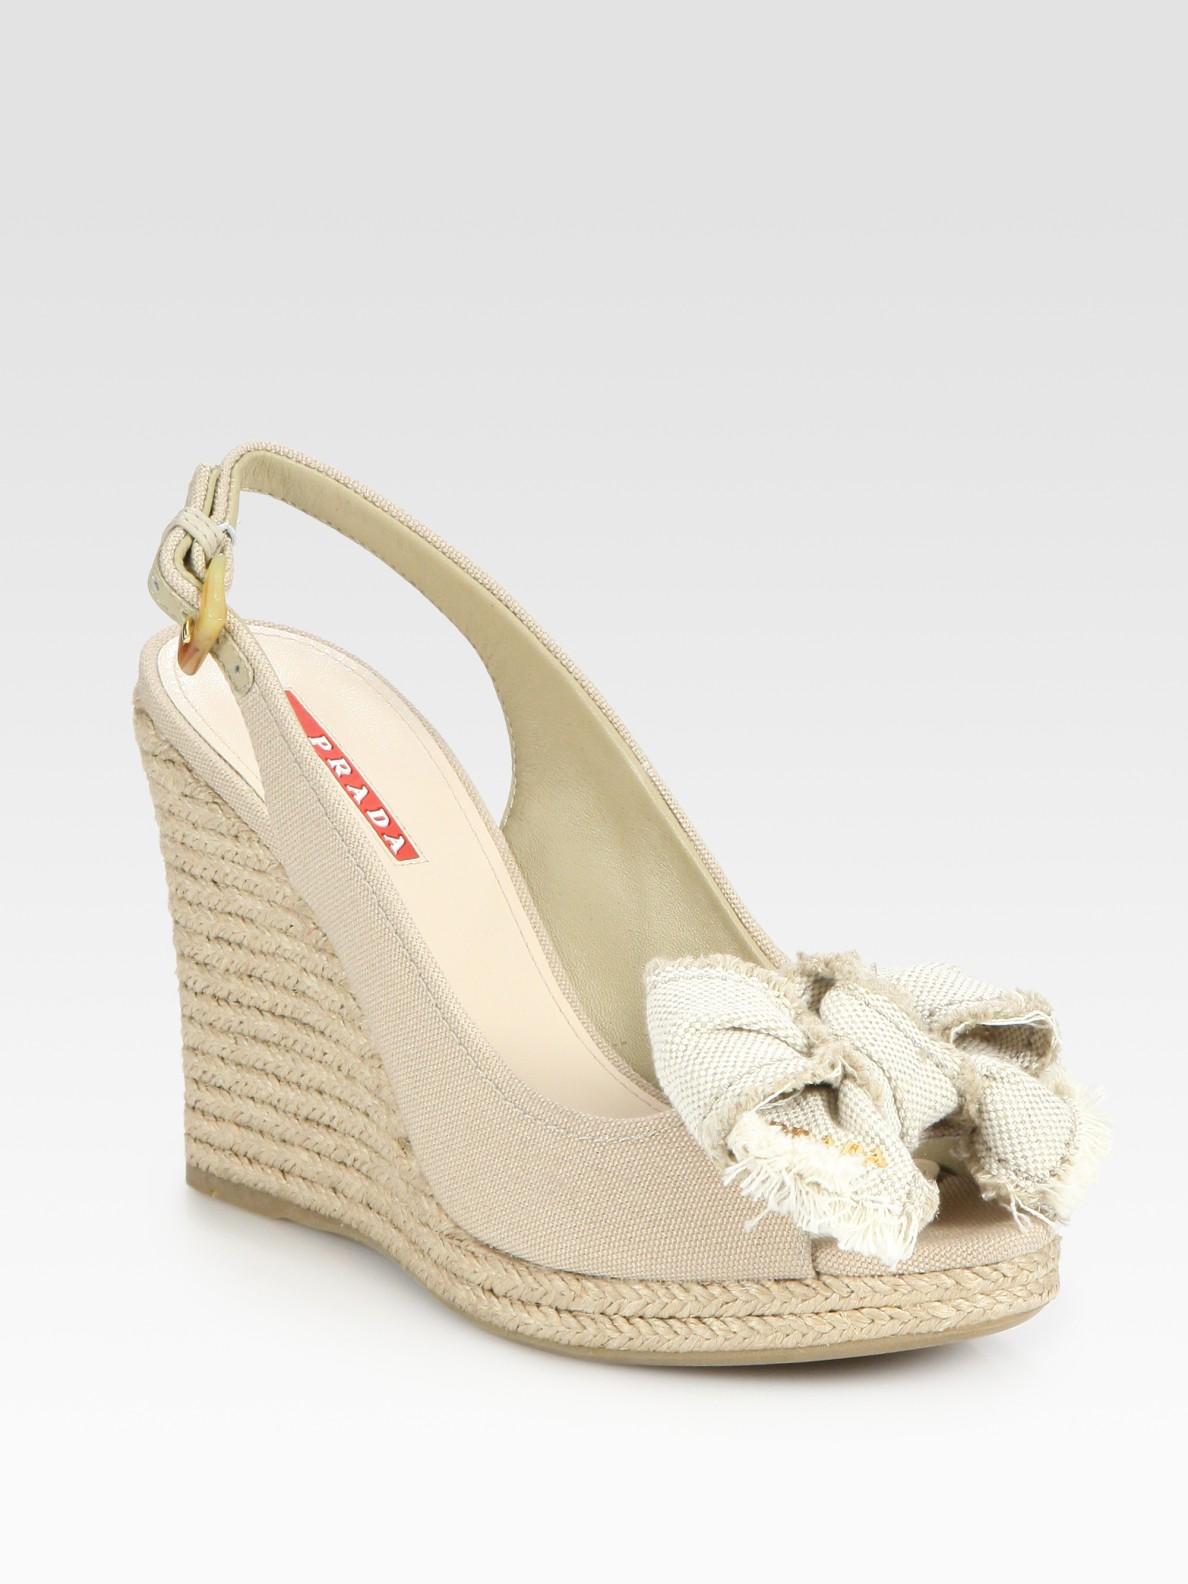 71286c6662ef Lyst - Prada Canvas Slingback Espadrille Wedge Sandals in Natural